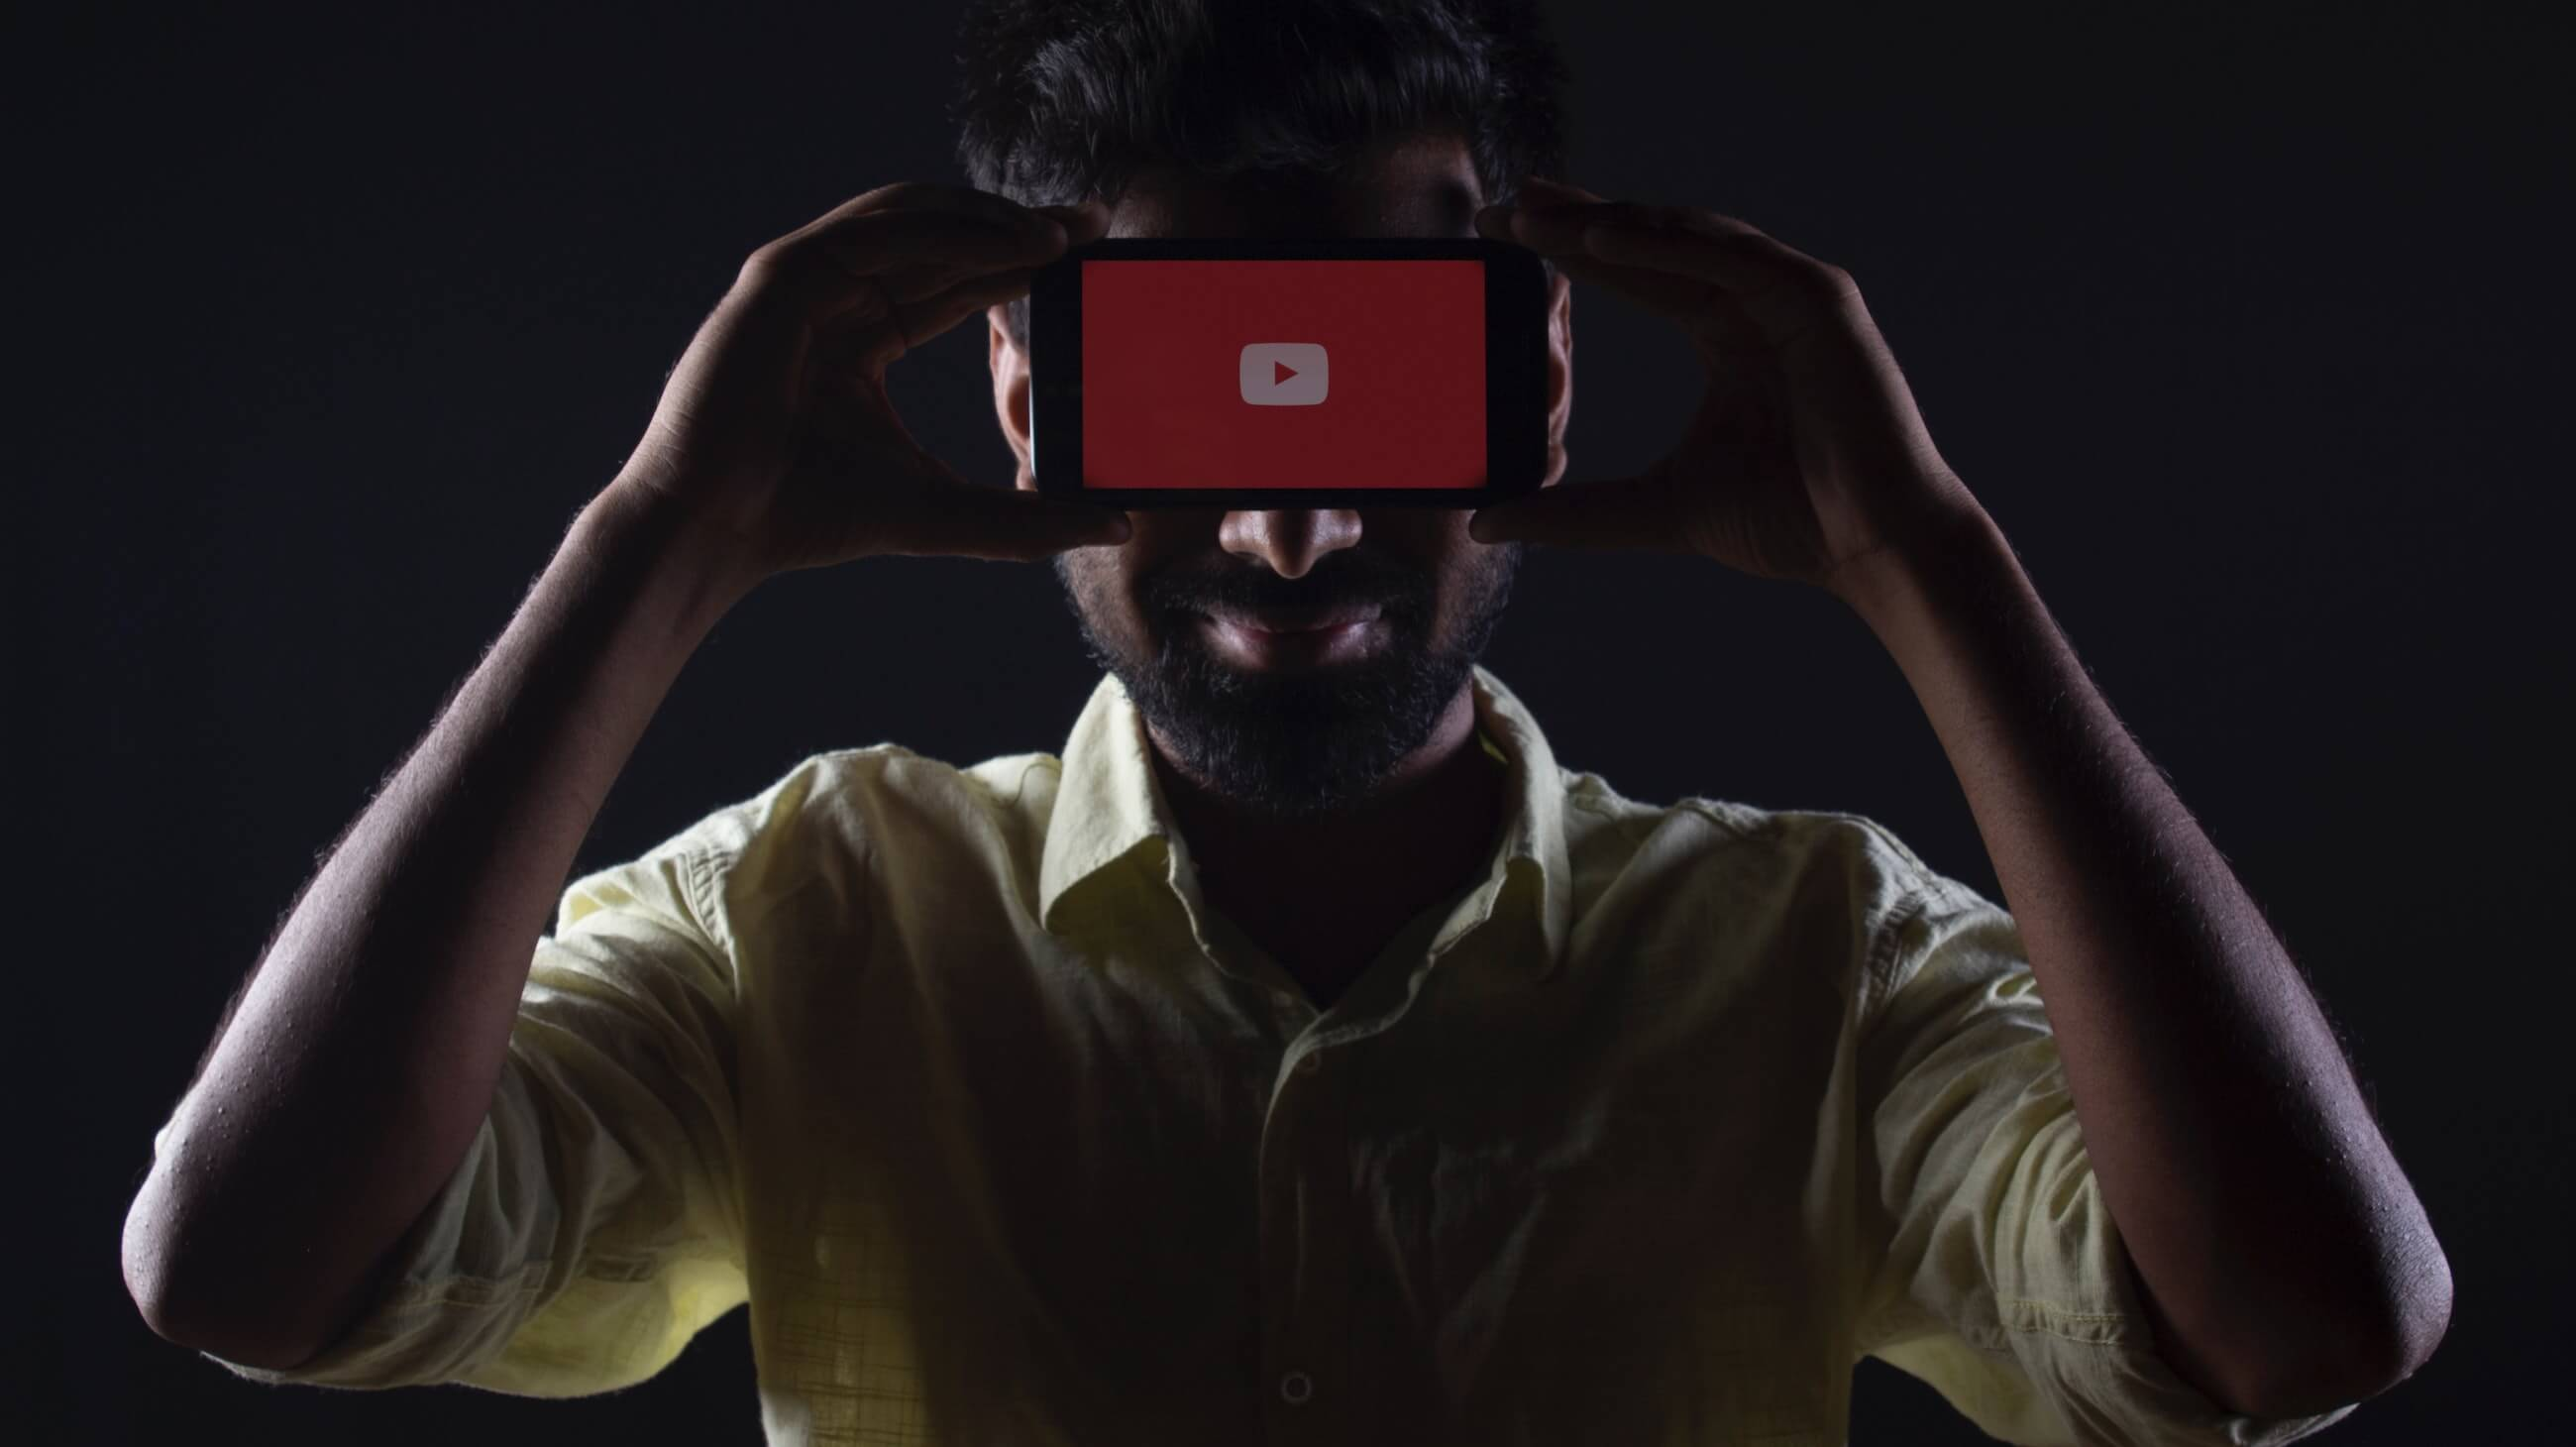 youtube цензура конфиденциальность правила видеостриминга телефон перед лицом логотип youtube